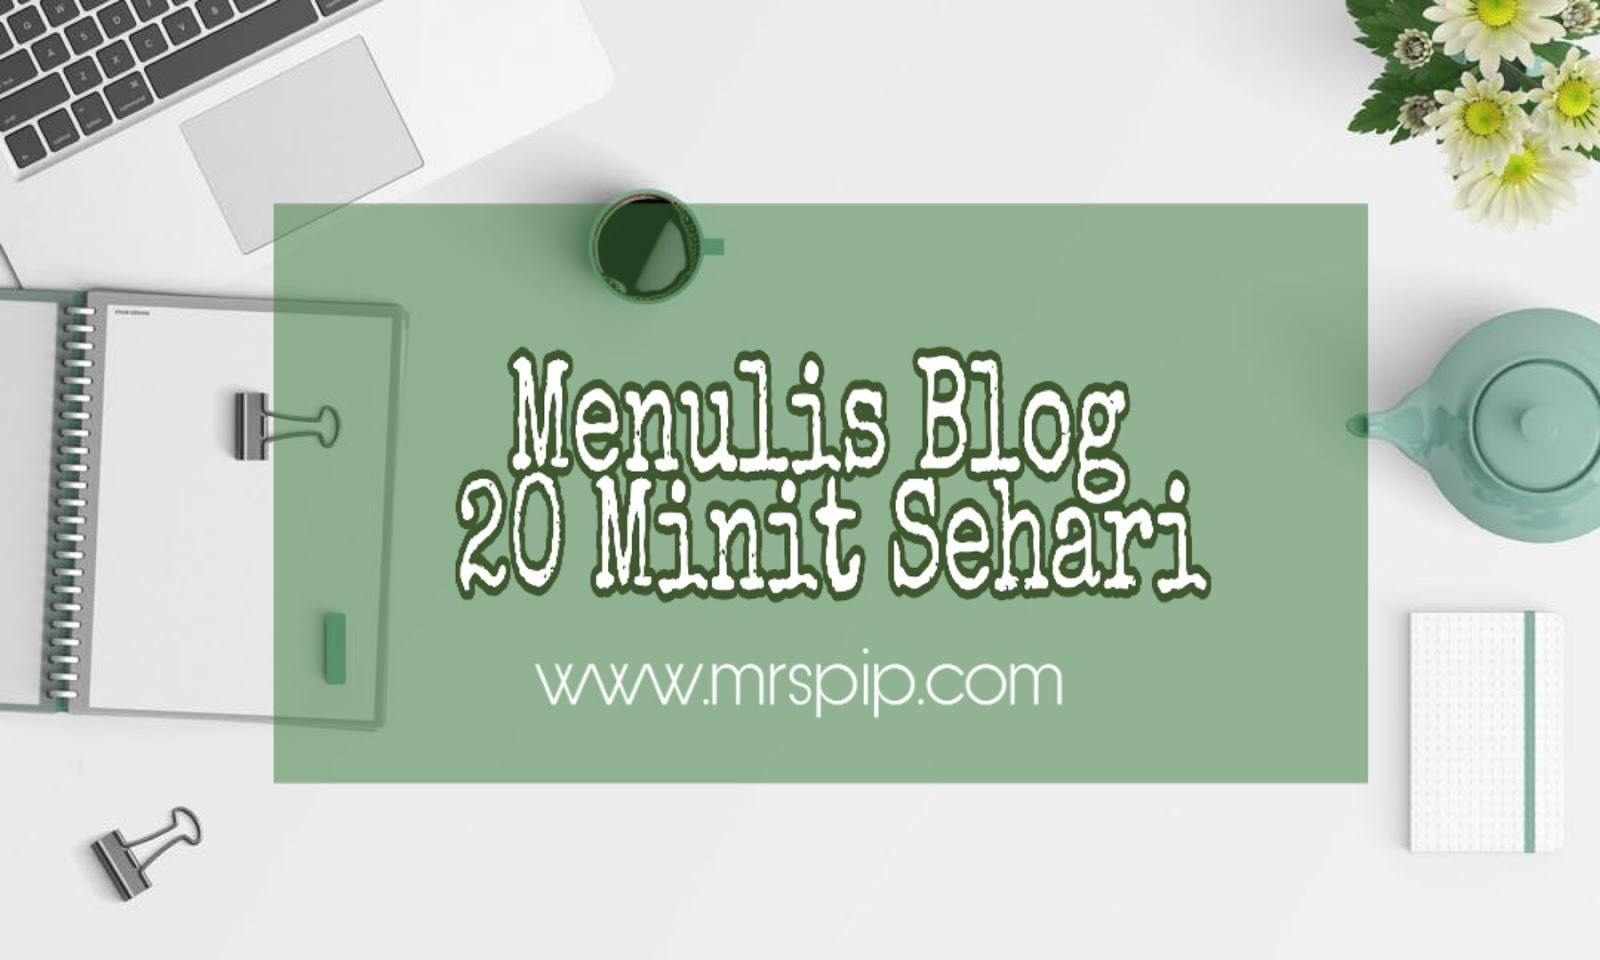 tips pantas menulis blog 20 minit setiap hari